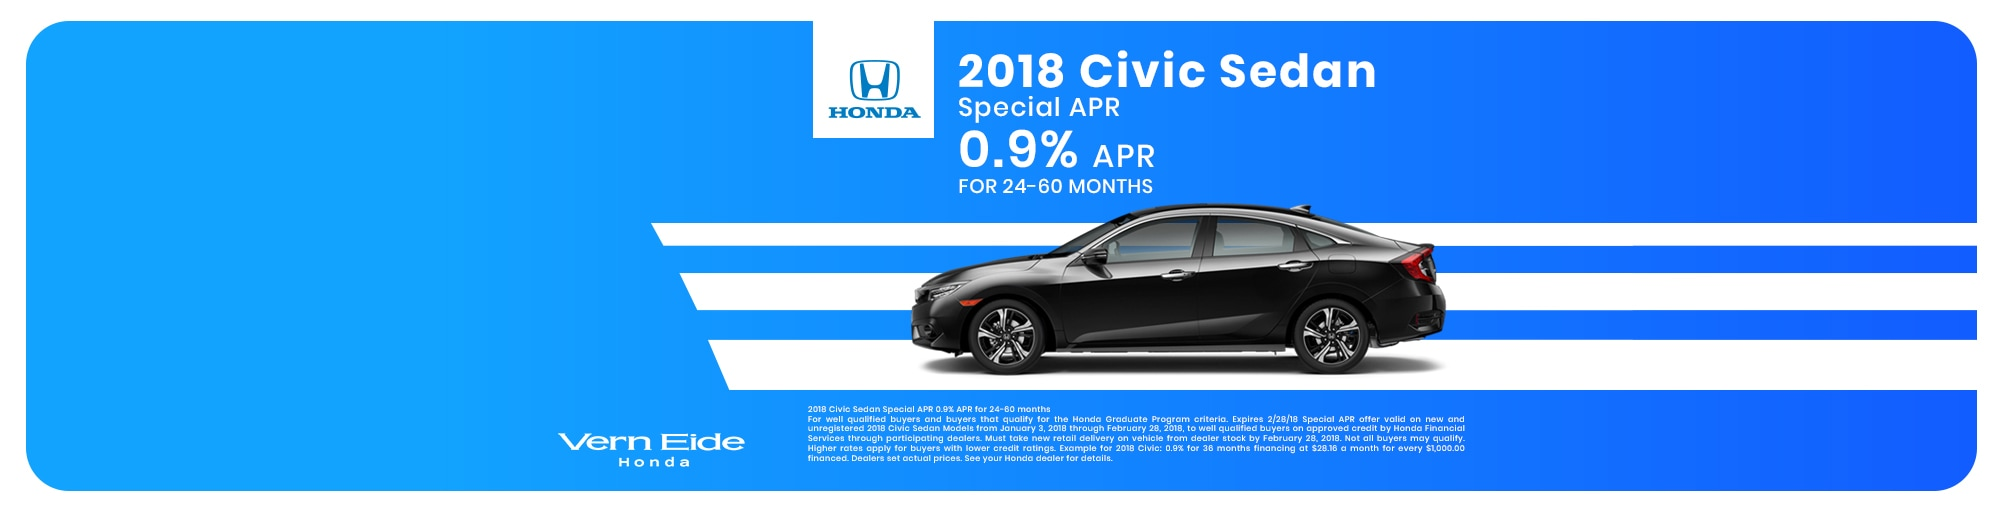 Vern Eide Honda Sioux Falls >> Vern Eide Honda | New Honda dealership in Sioux Falls, SD 57108